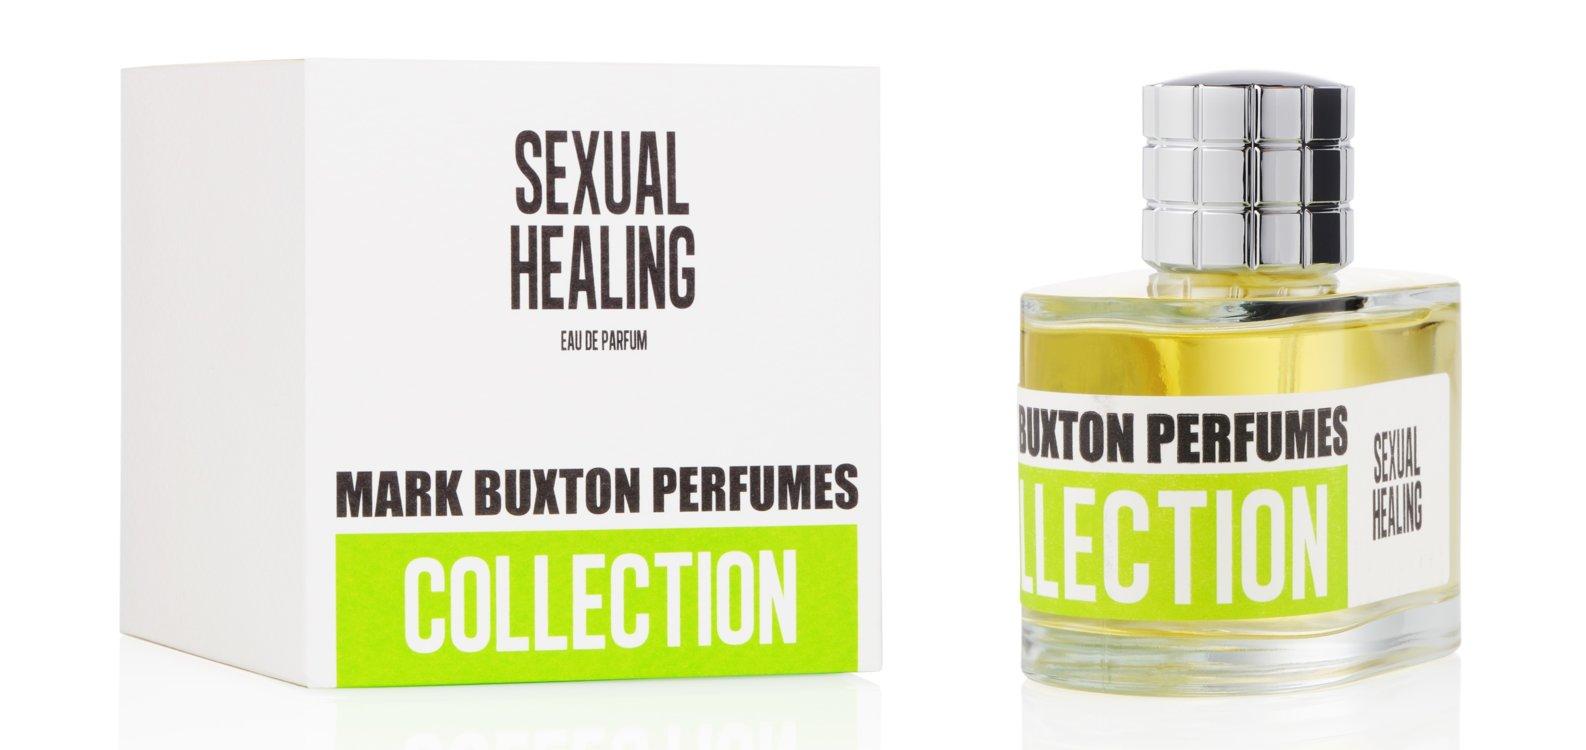 Аромат 'Sexual Healing' ('Исцеление сексом'), Mark Buxton Perfumes